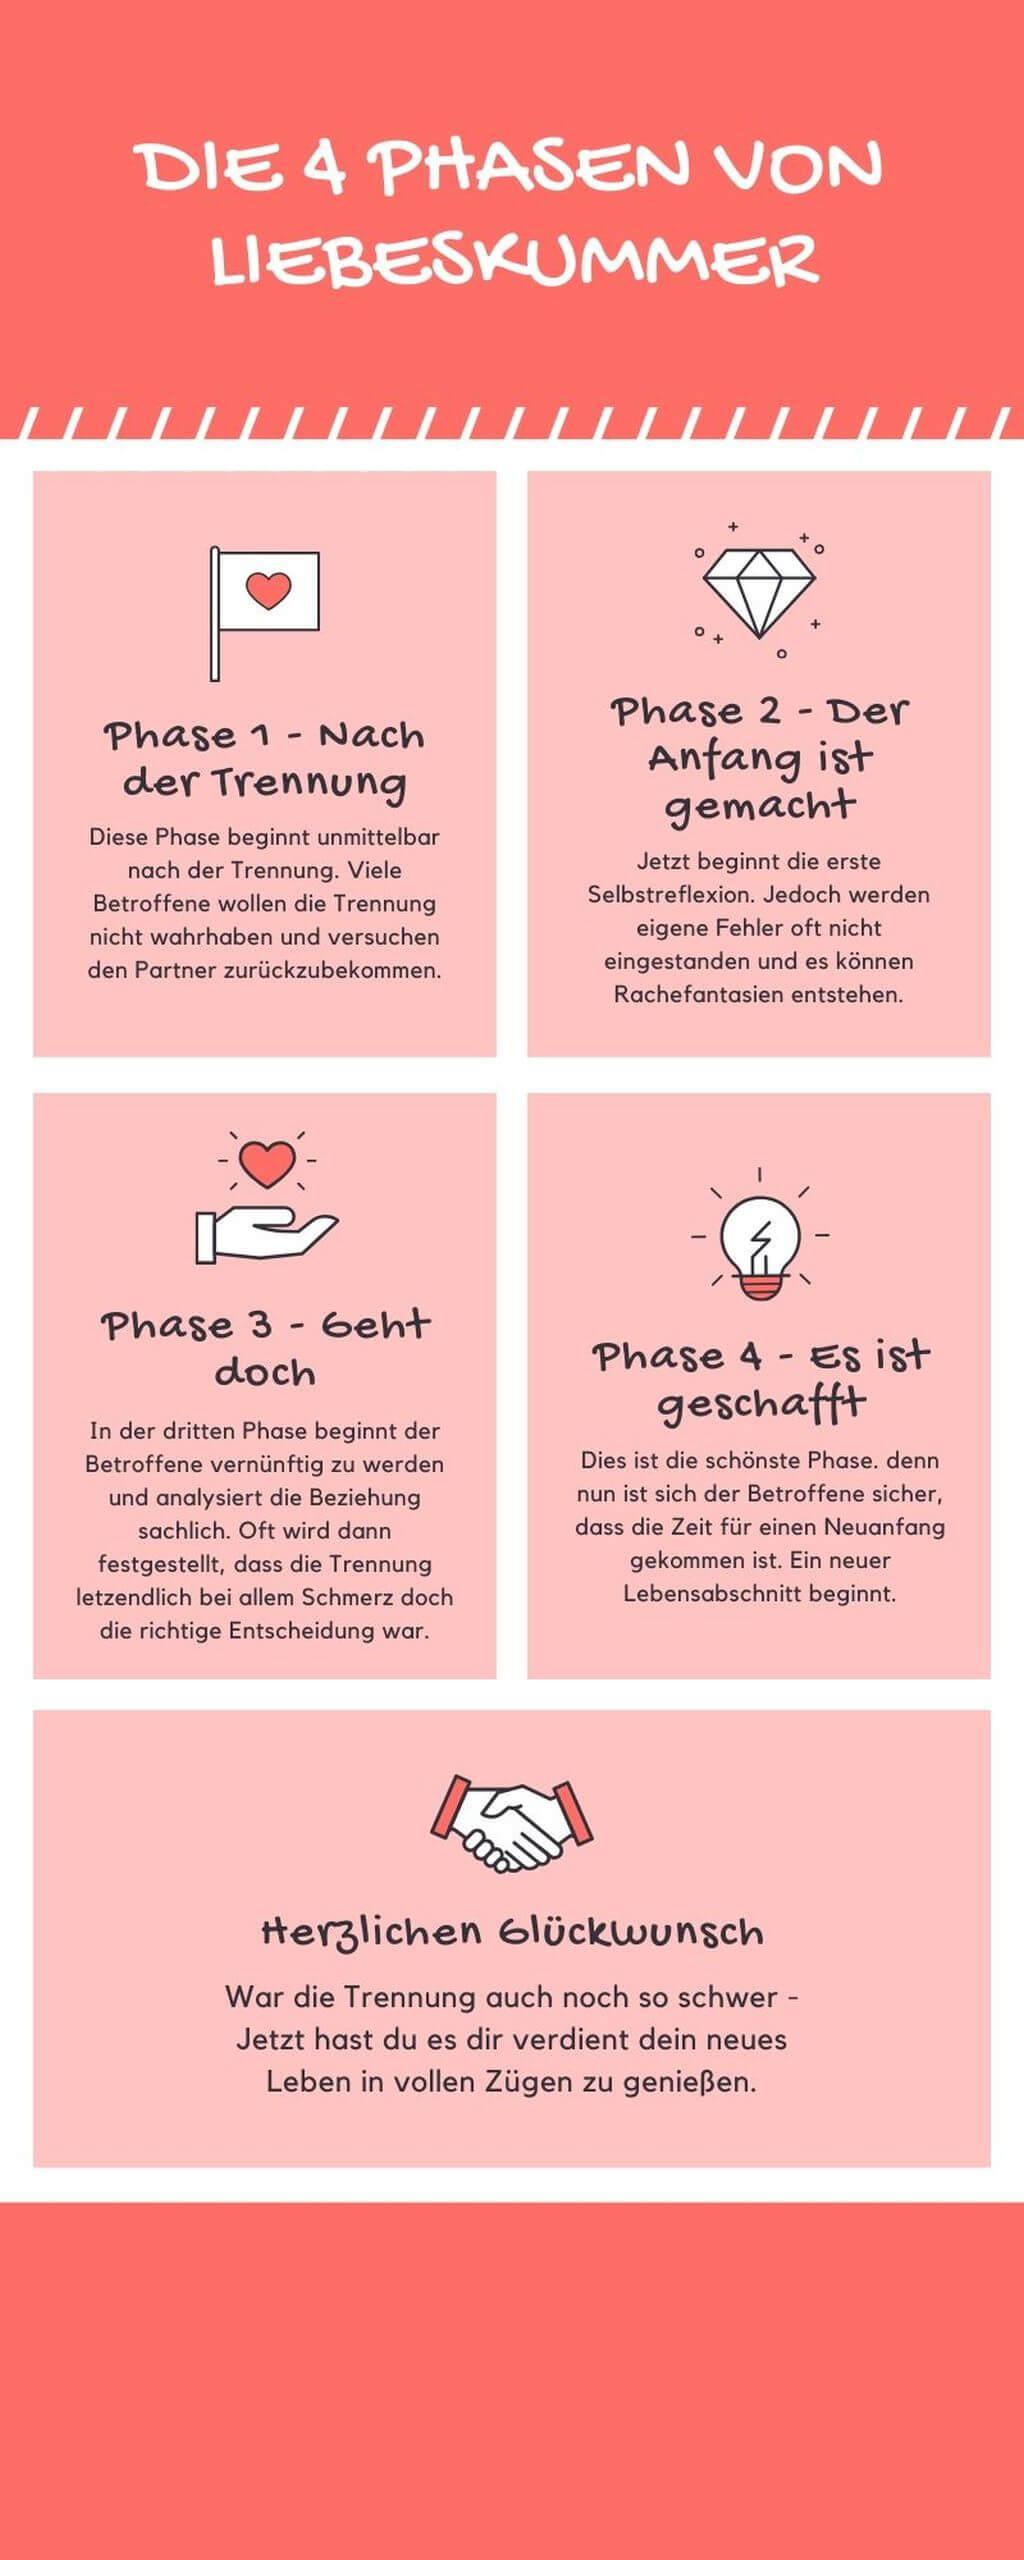 Liebeskummer Phasen Infografik